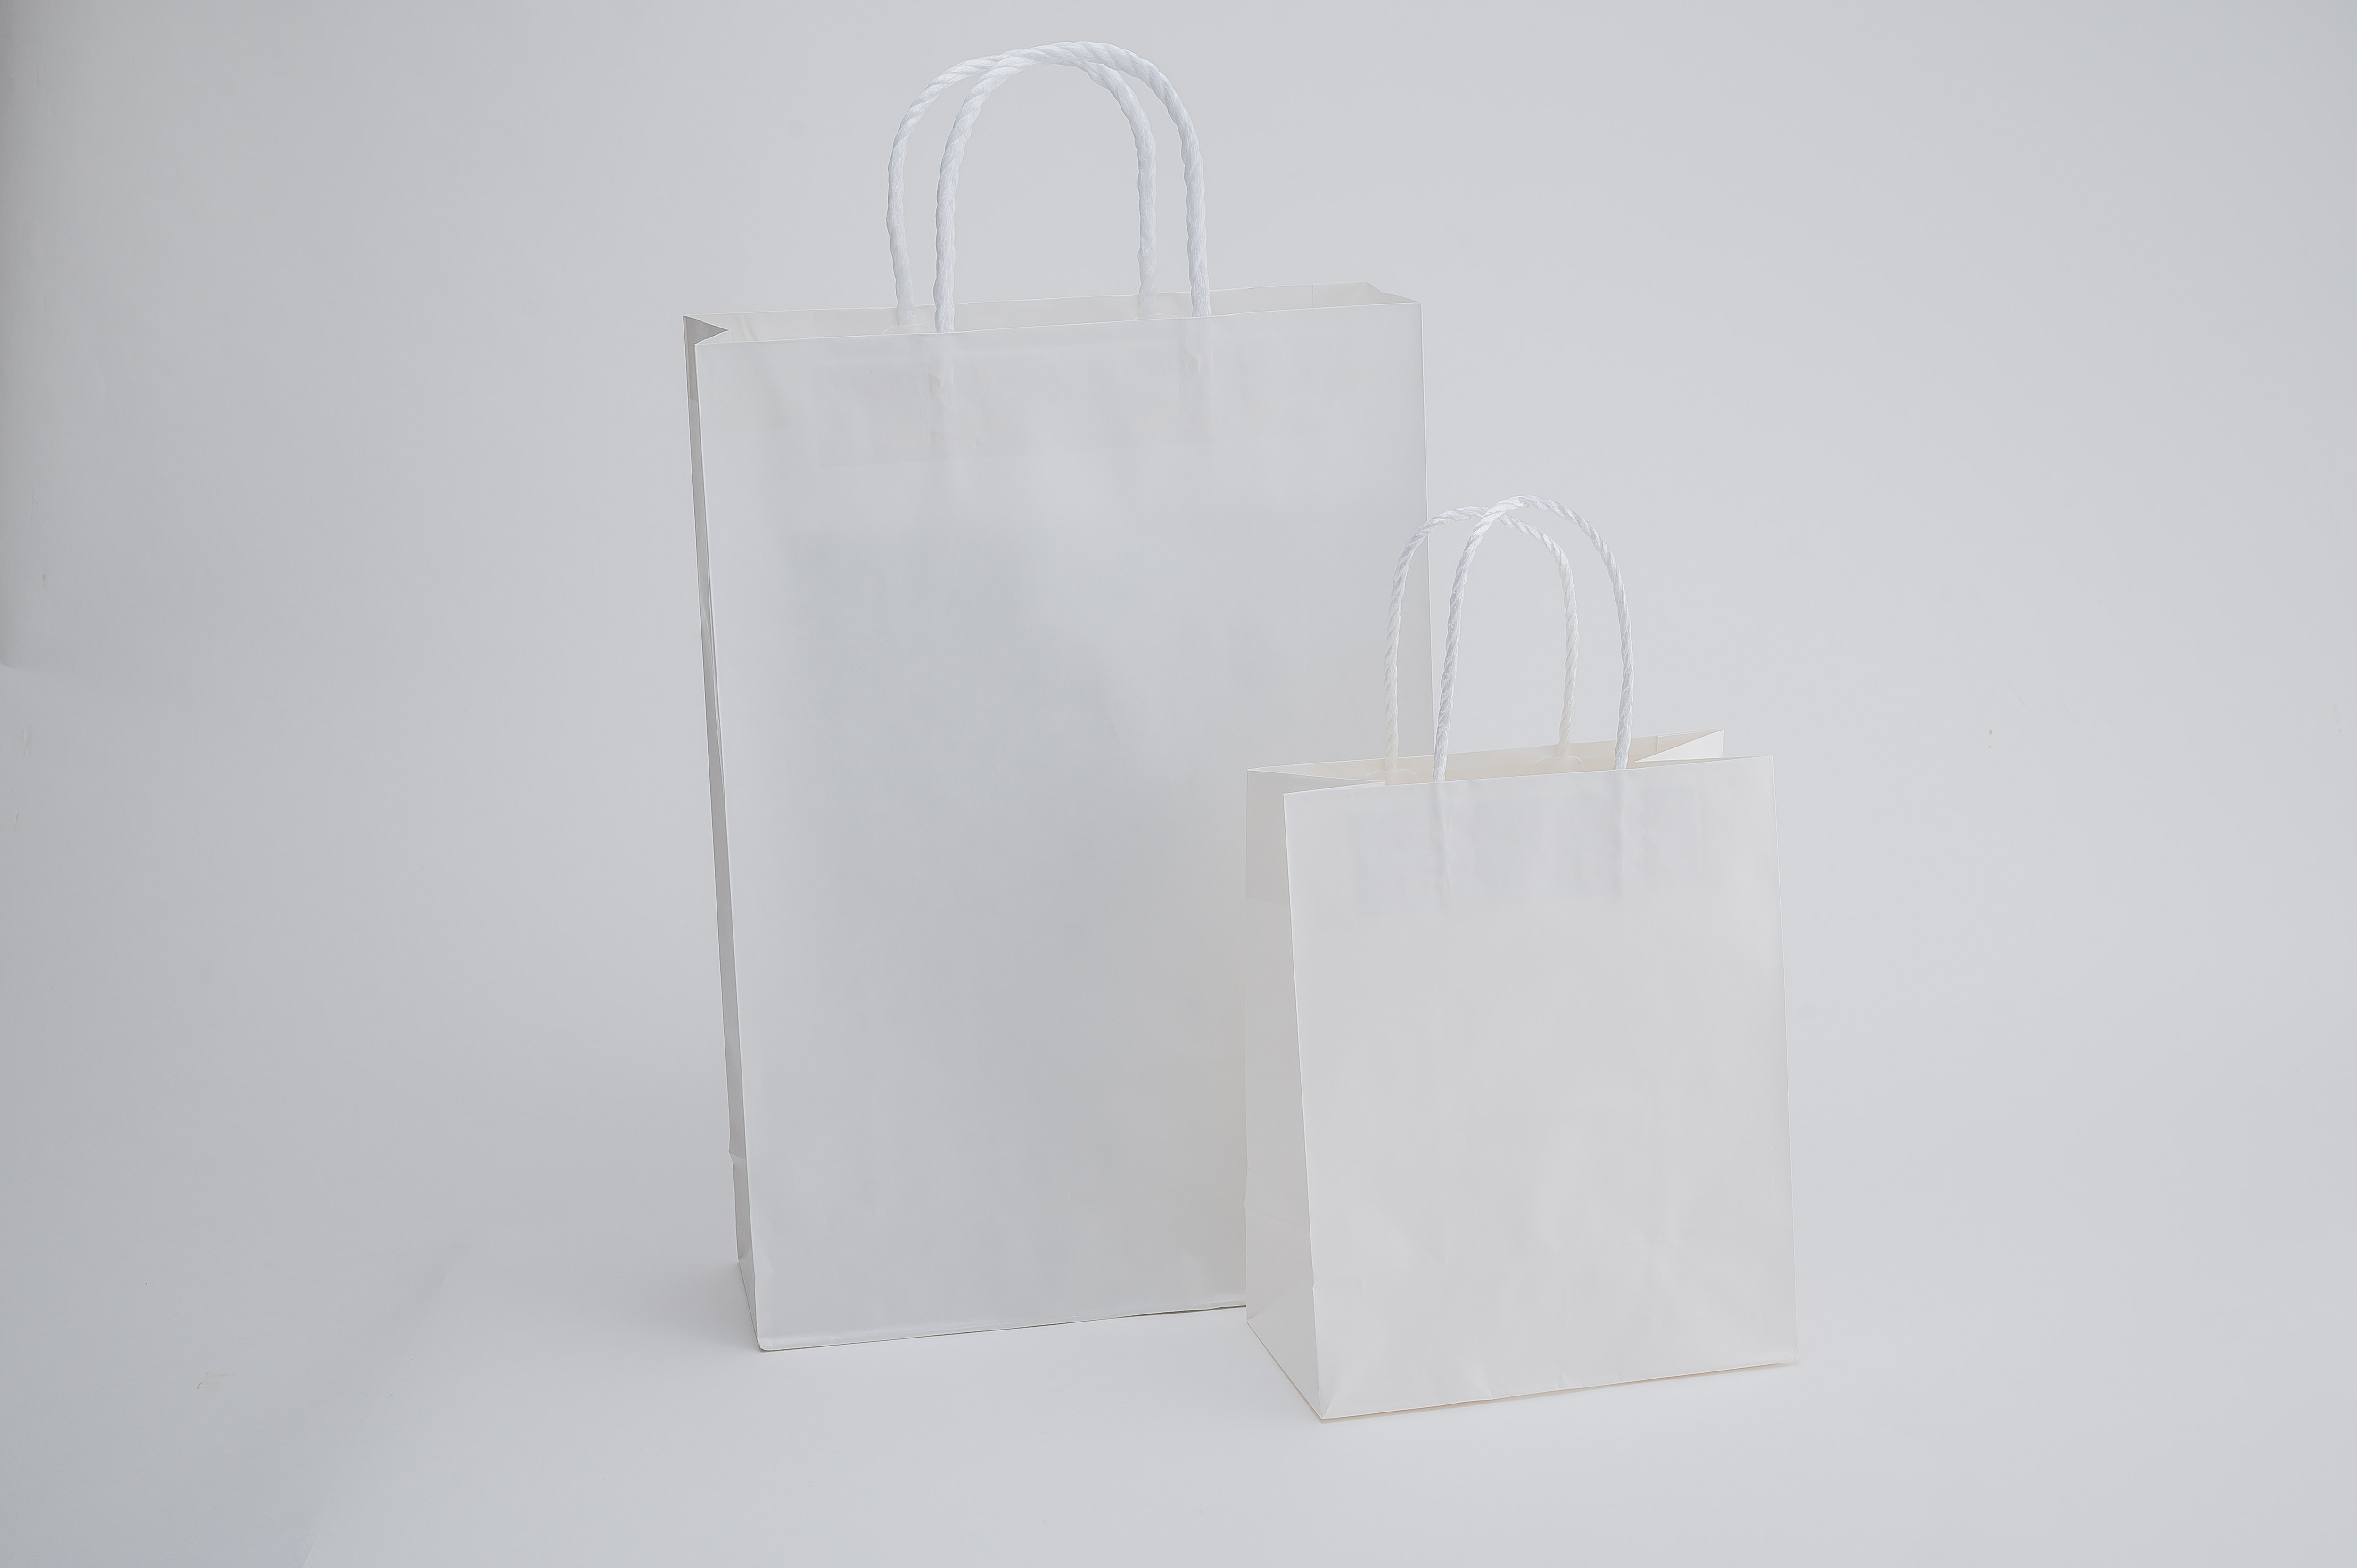 sara-la(さらら)の手提げ袋